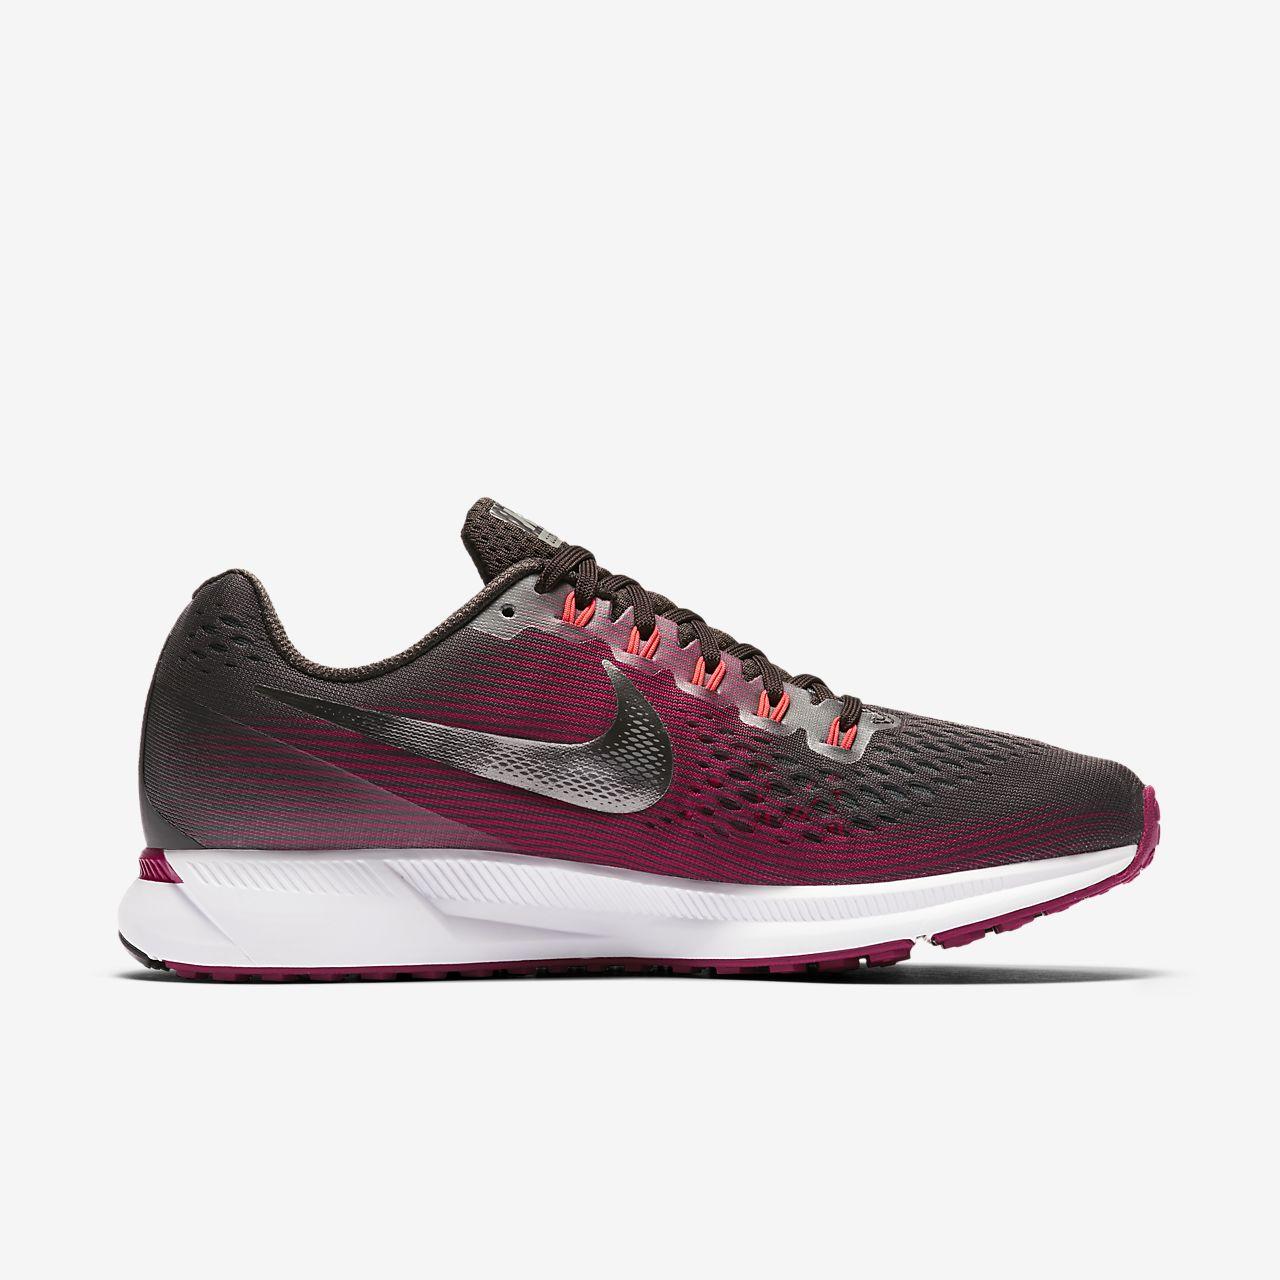 ... Nike Air Zoom Pegasus 34 Gem Women's Running Shoe